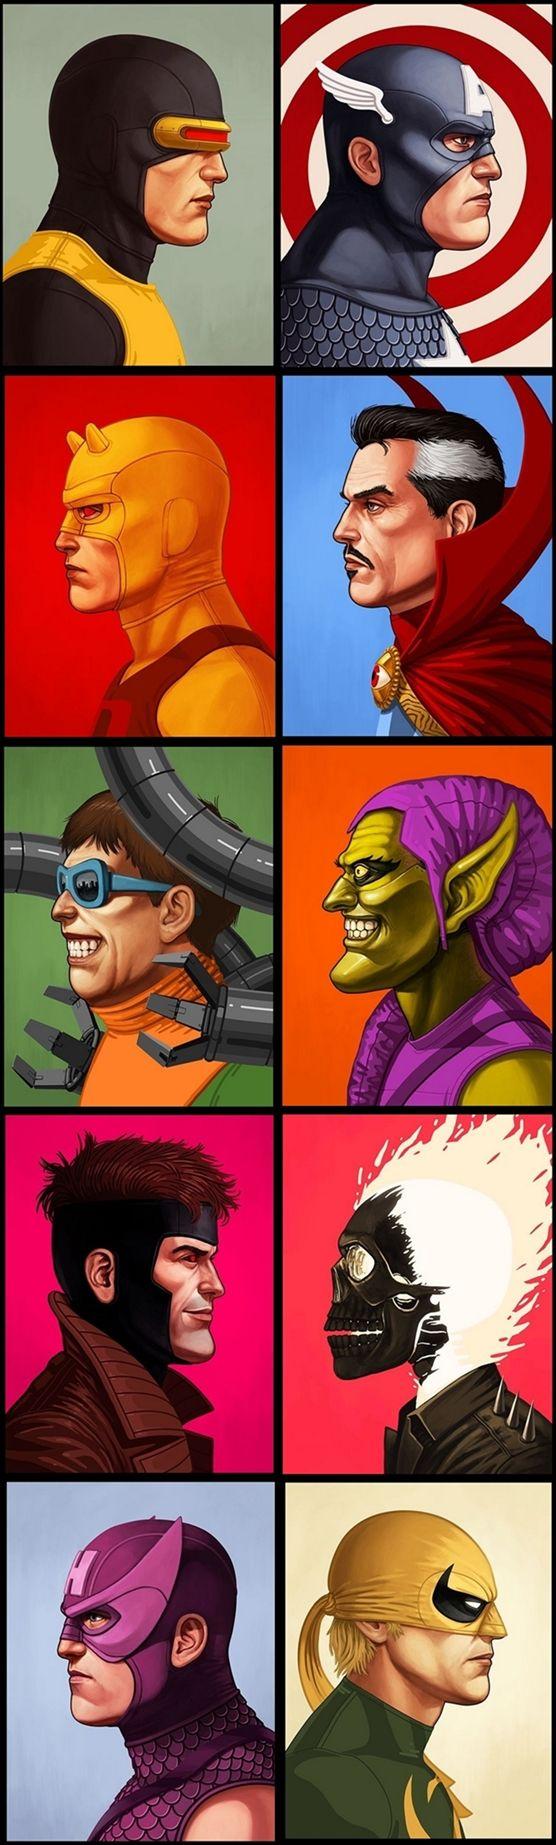 MARVEL-Themed Showcase At The Mondo Gallery / Ciclops / Captain America / Gambit / Hawkeye / Green Goblin / Octopus